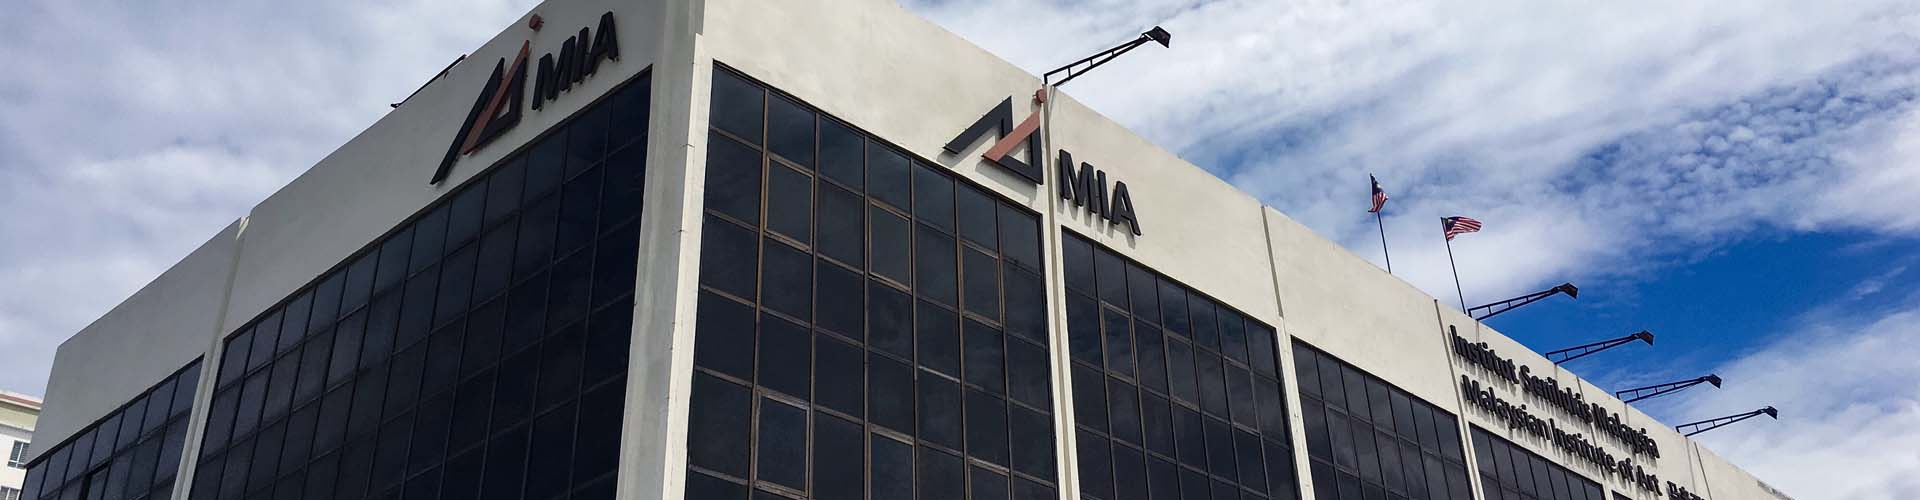 gtimedia-coursesmalaysia-institution-top-mia-2018.jpg